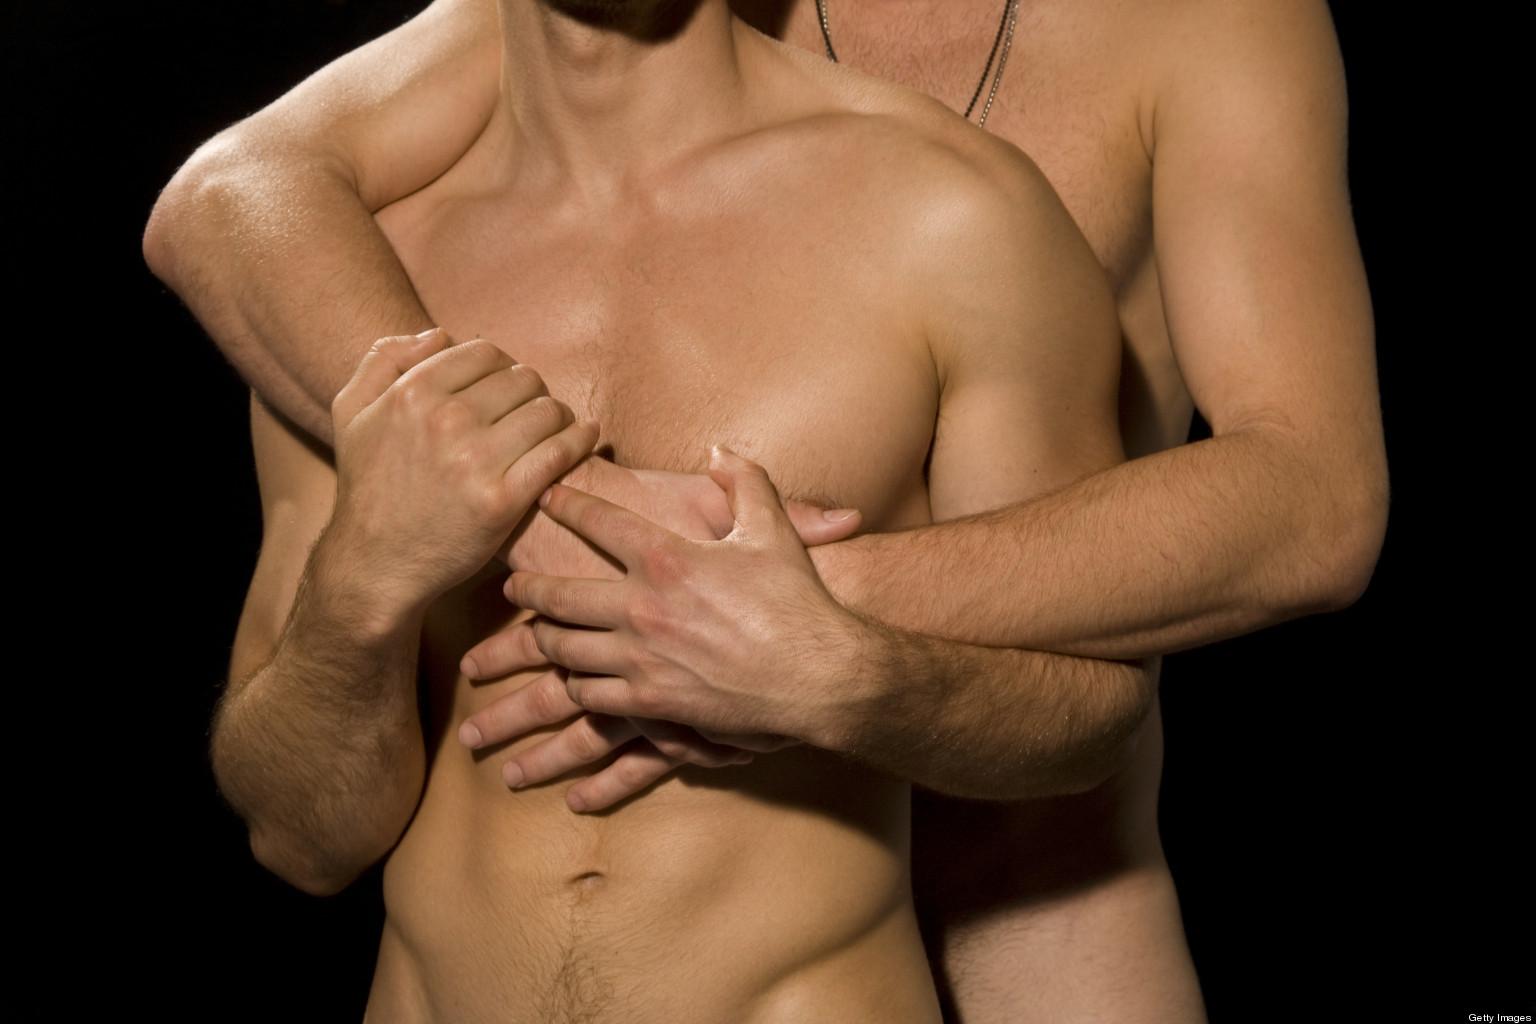 Gay Porn Pics, Naked Men Galleries,